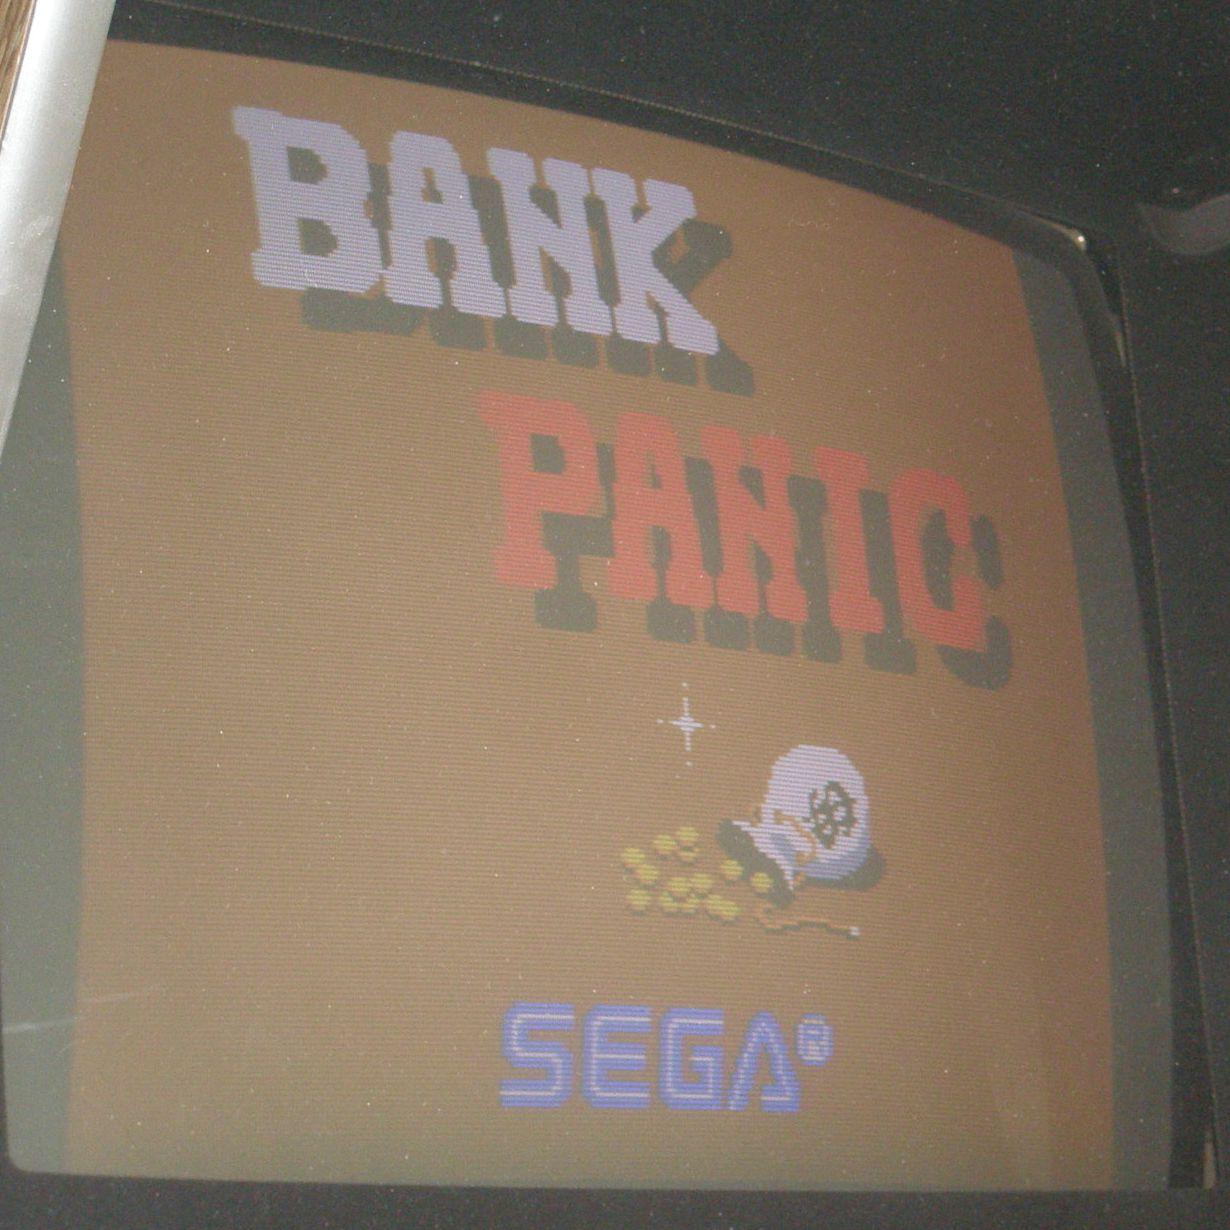 http://arcadius.esero.net/Arcade/Games/Non_Jamma_Fully_Working/Bank_Panic_04.jpg